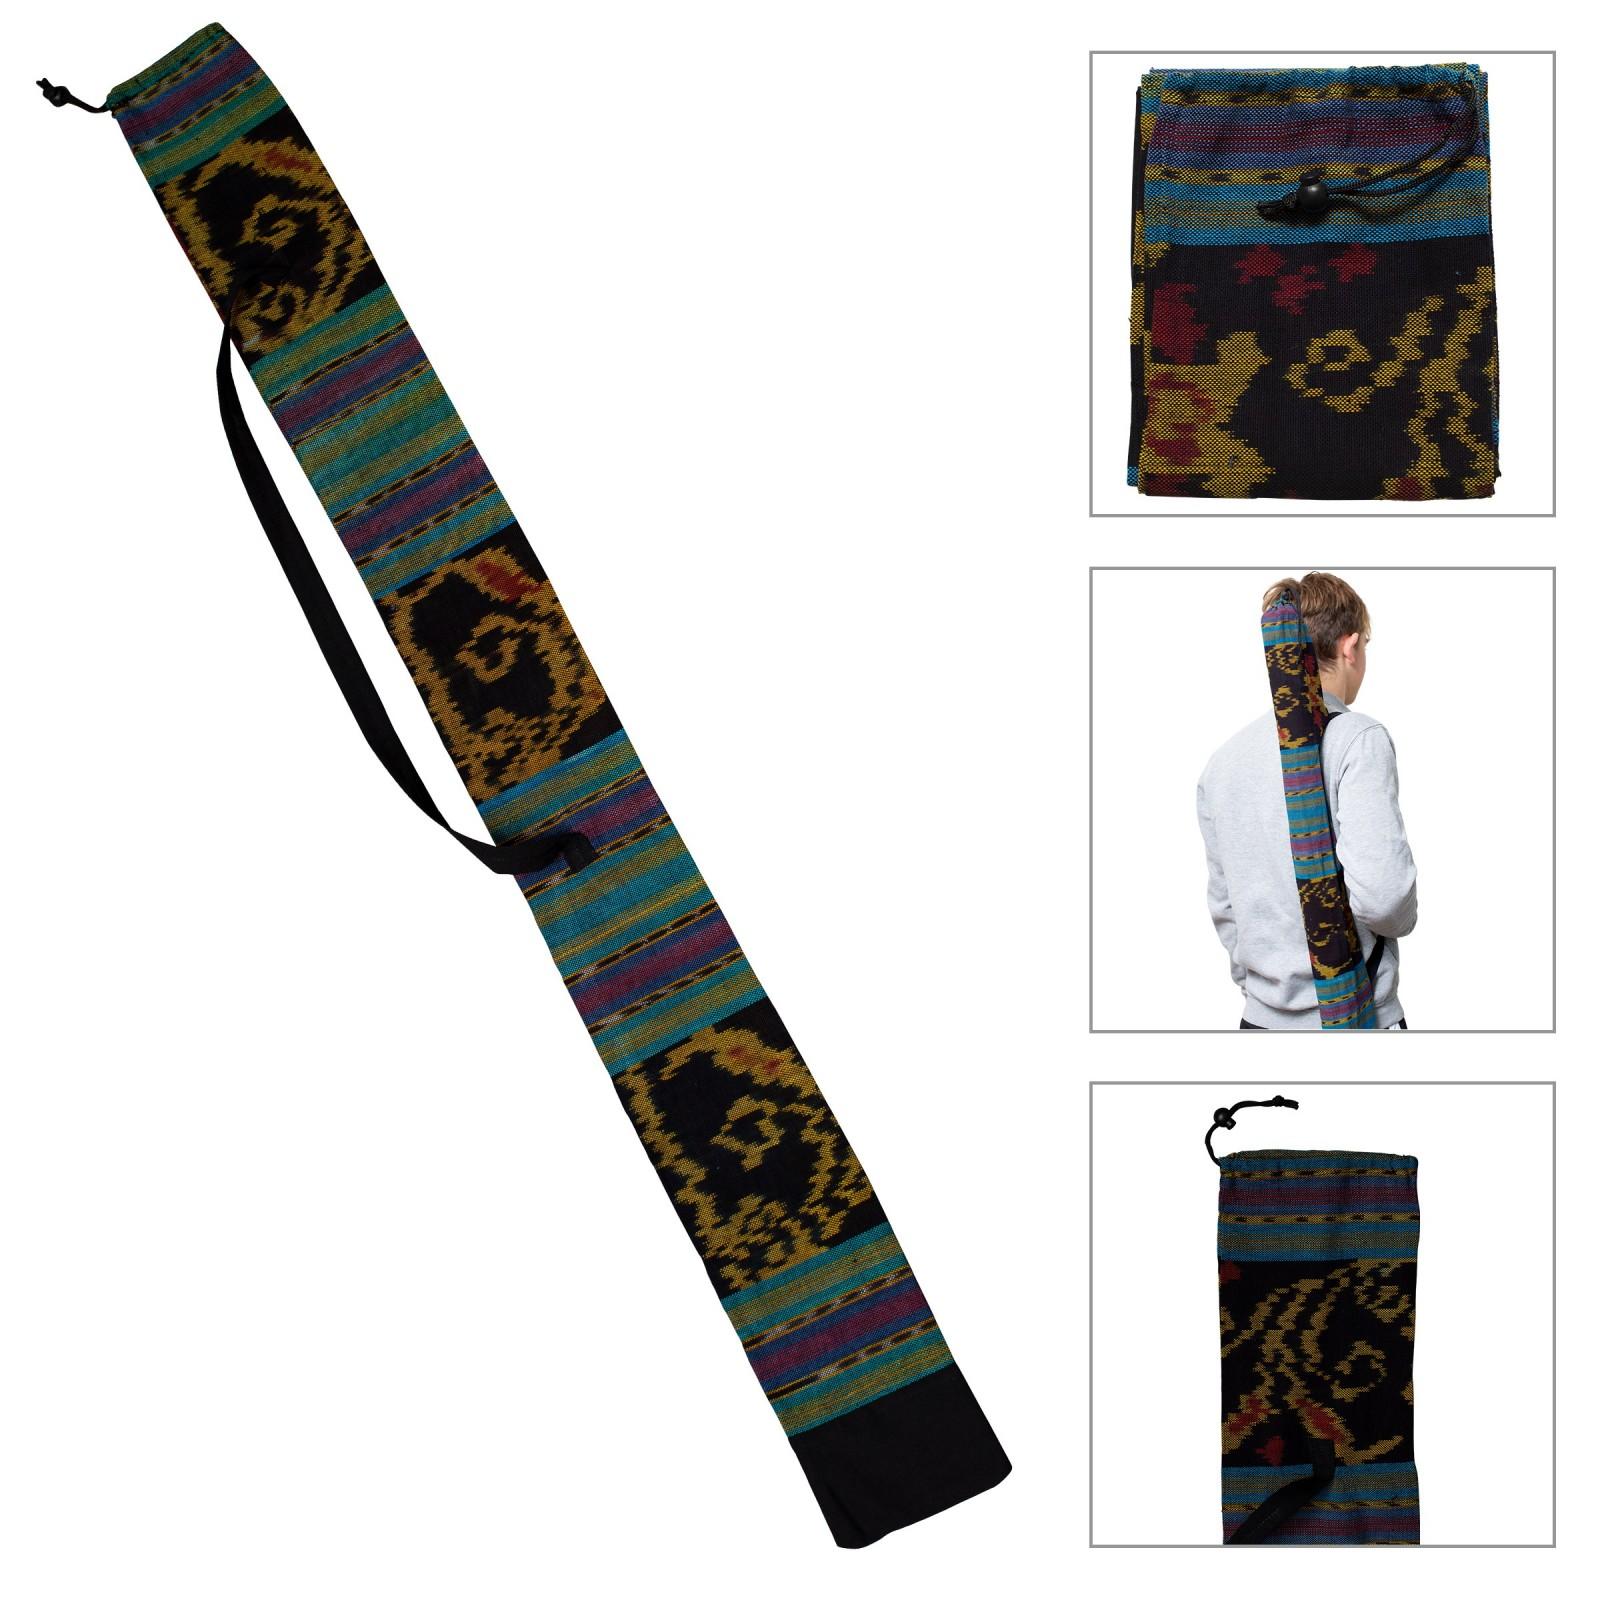 DIDGERIDOO BAG 125 cm - Sac Didgeridoo en tissu Ikat. Diamètre Ø 8 cm. Y compris sangle de transport